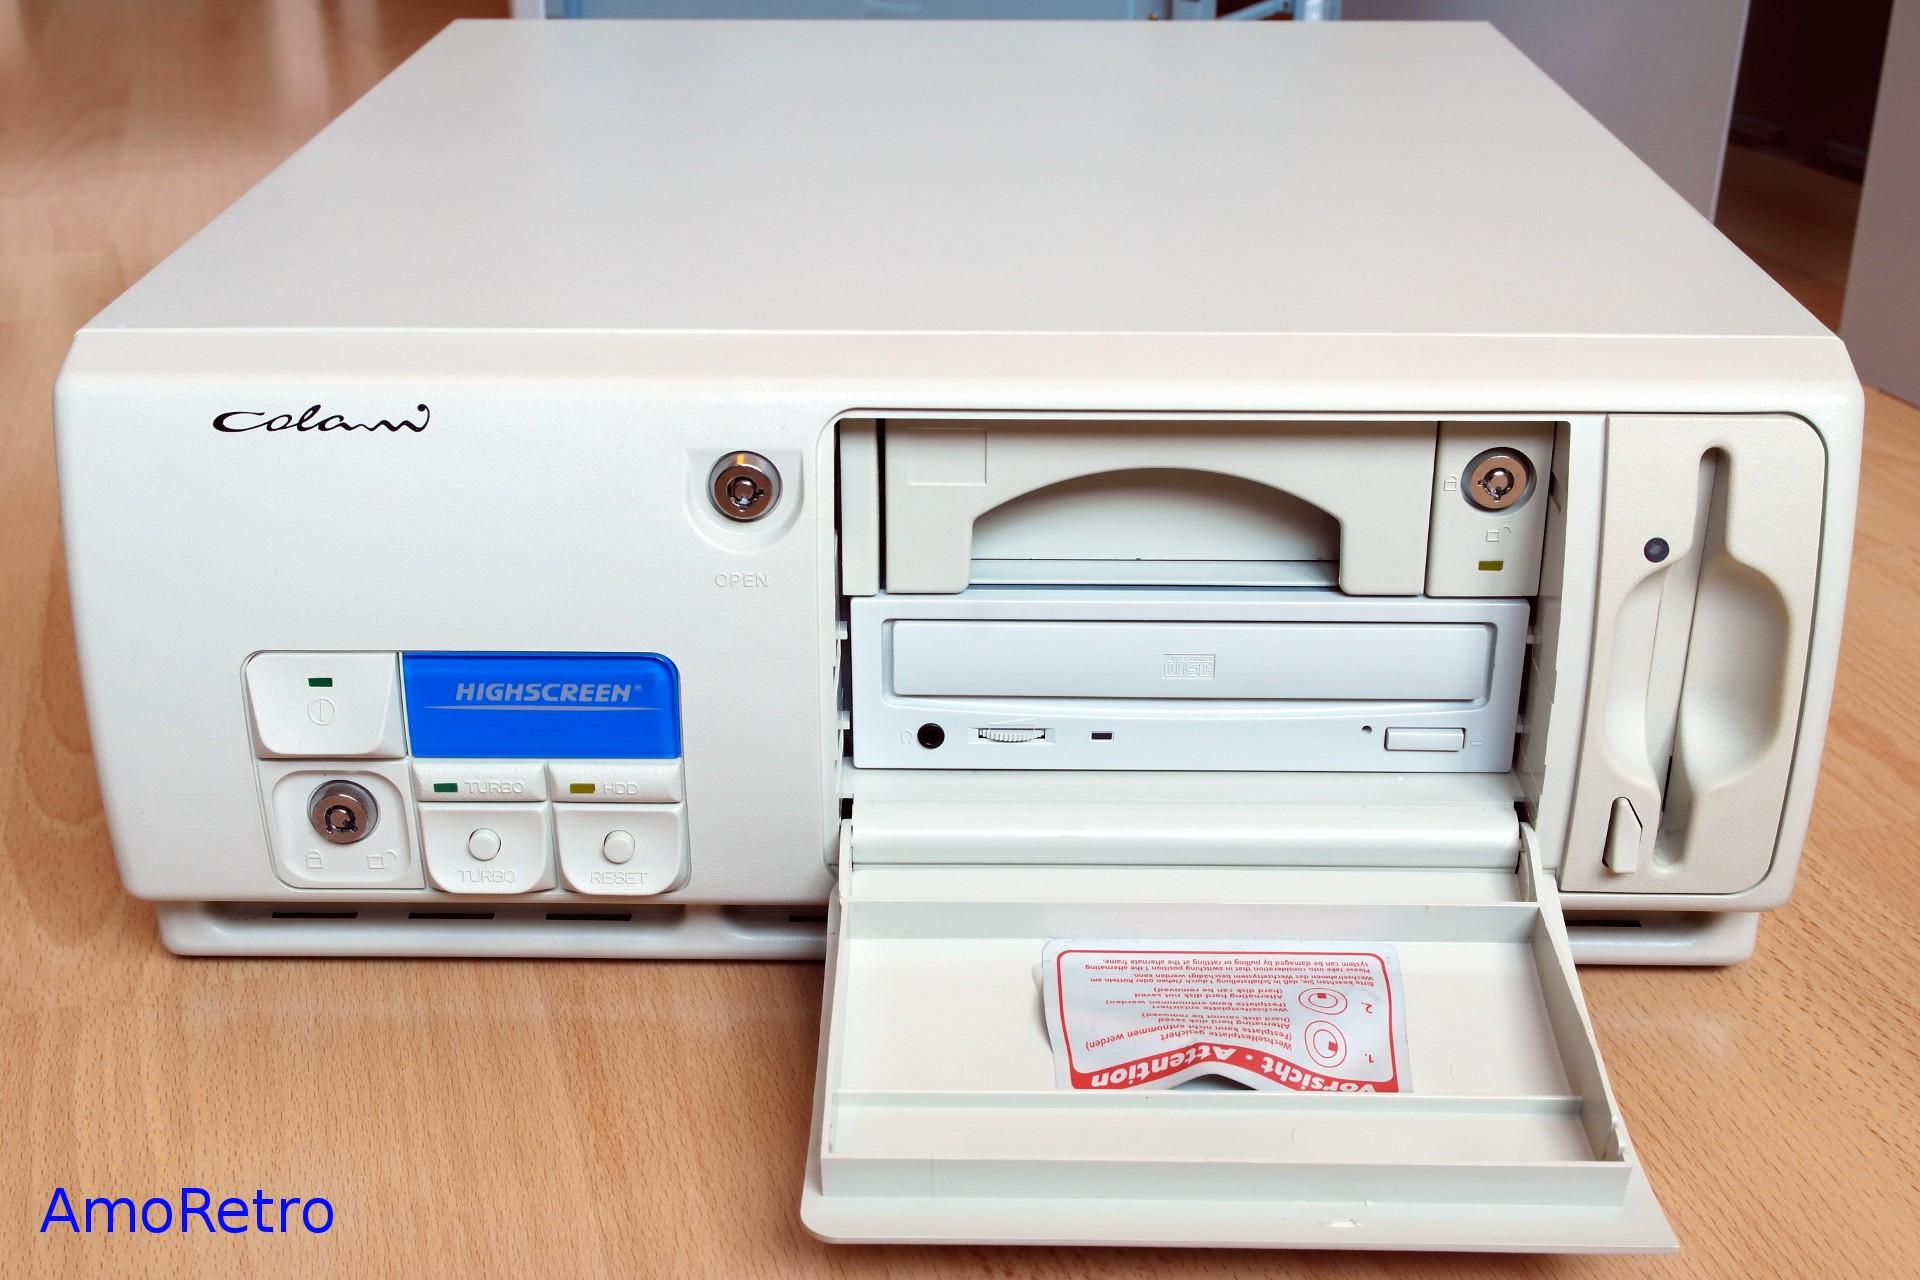 Highscreen Colani 486er Computer, DX4-100MHz, 32MB RAM ...